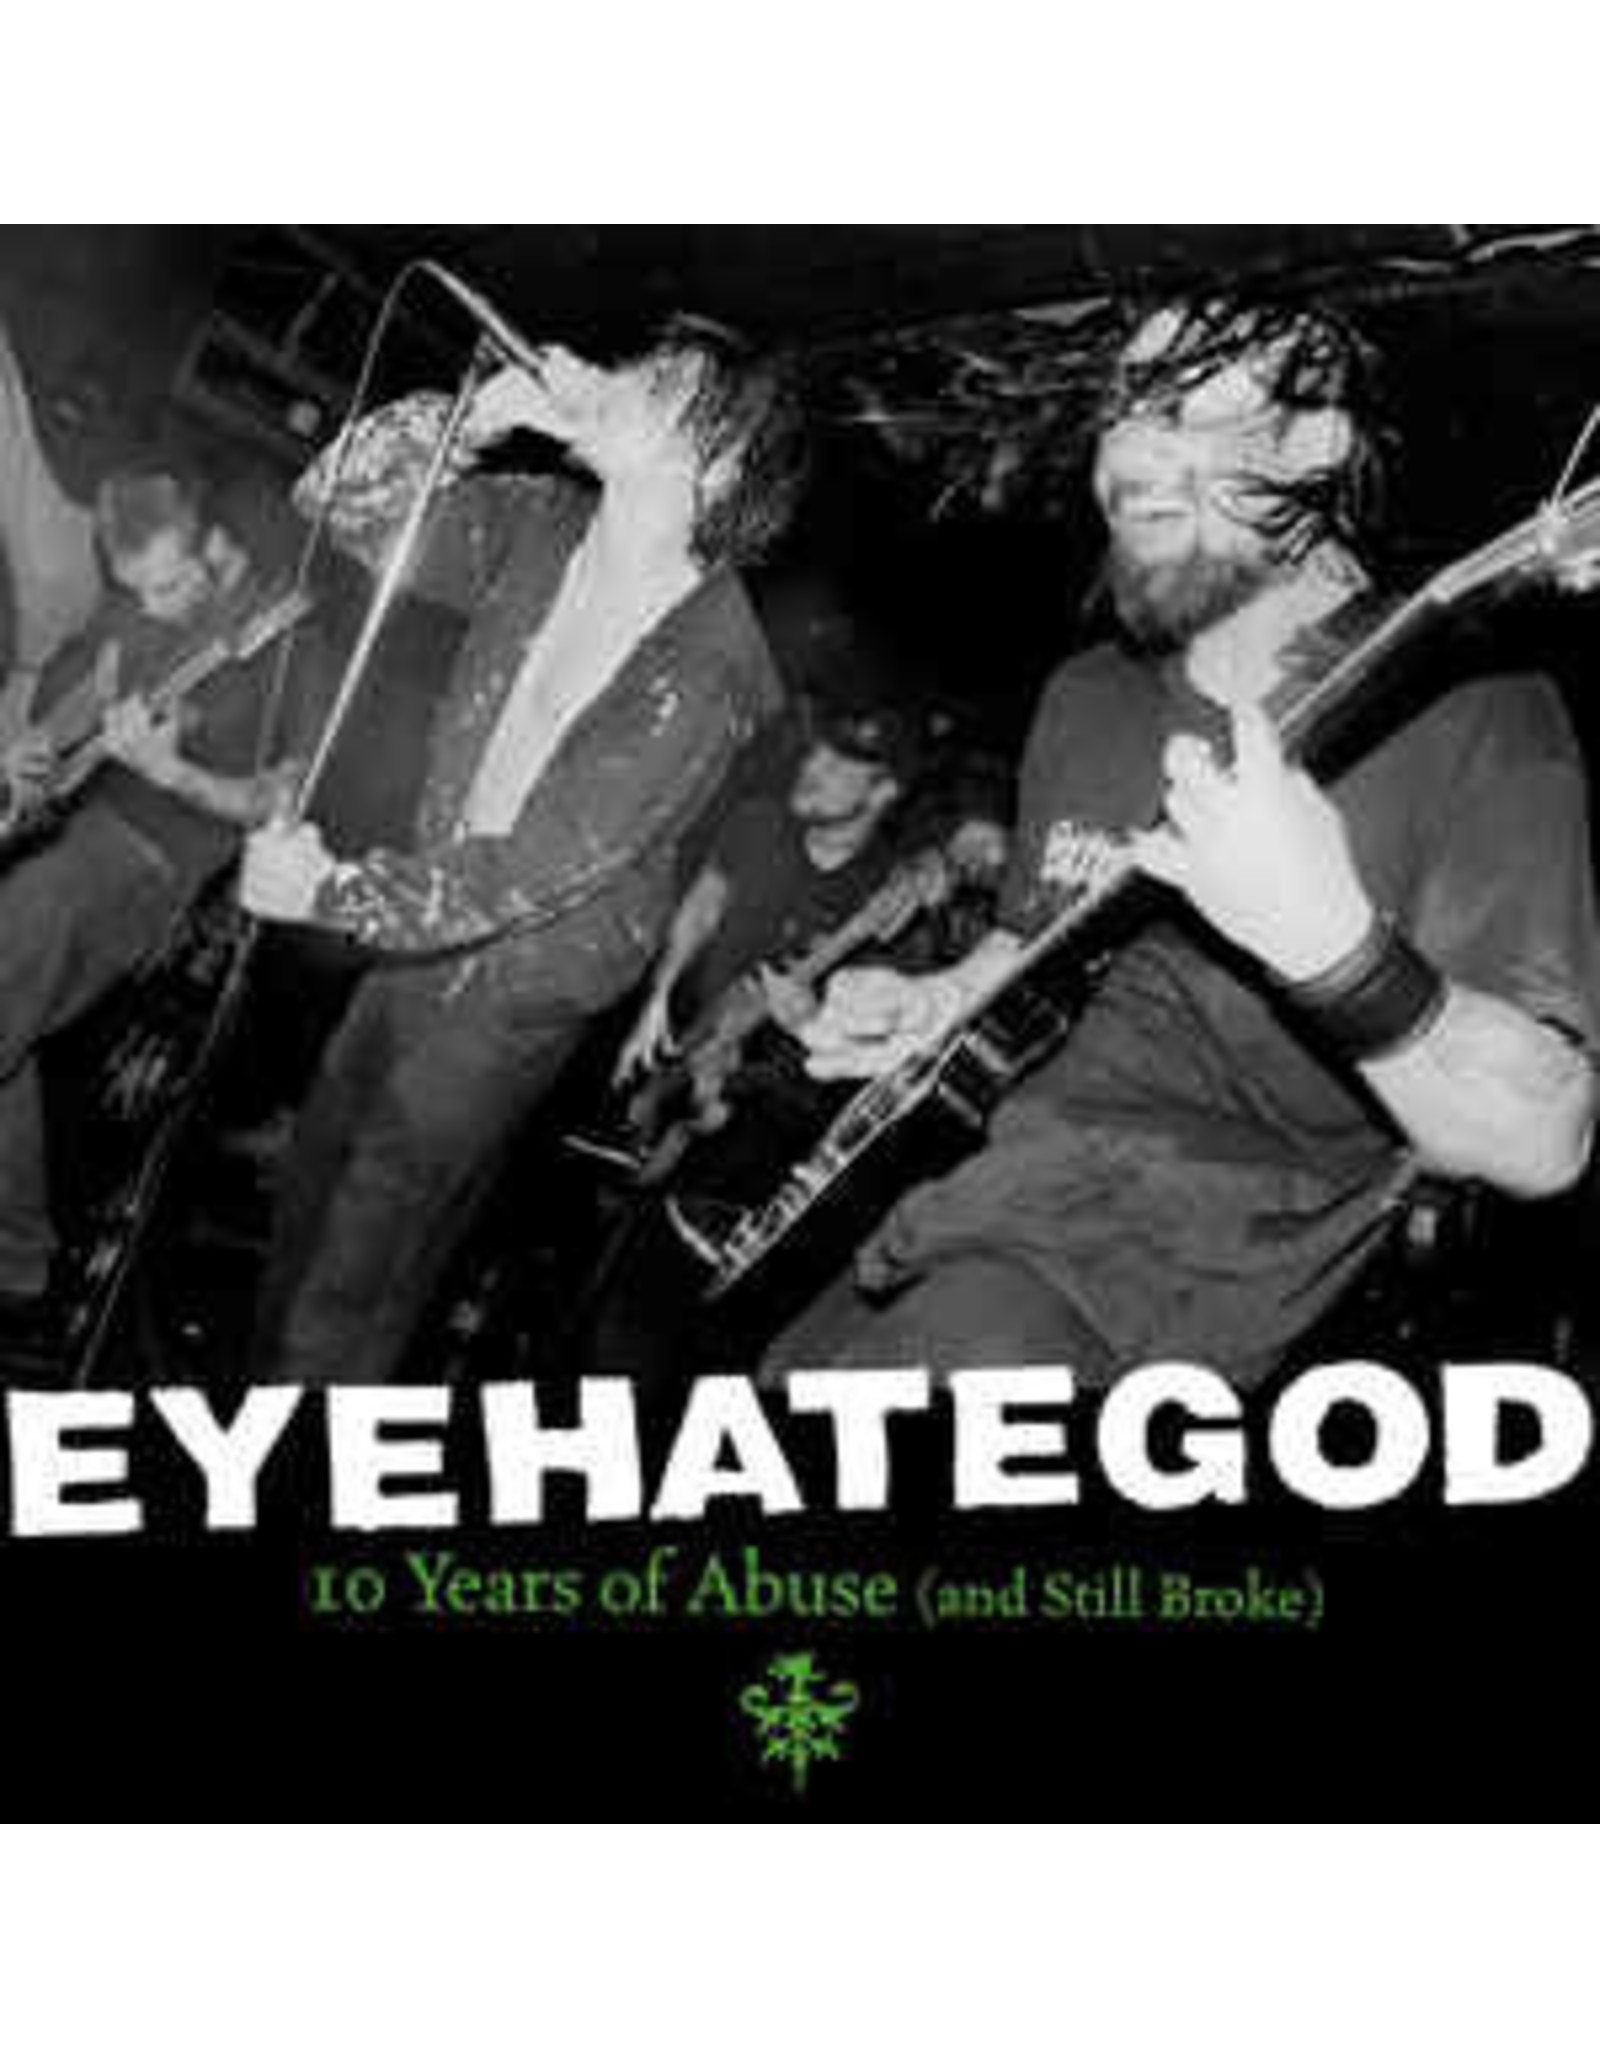 Eyehategod - 10 years of Abuse LP (Limited Splatter Vinyl)